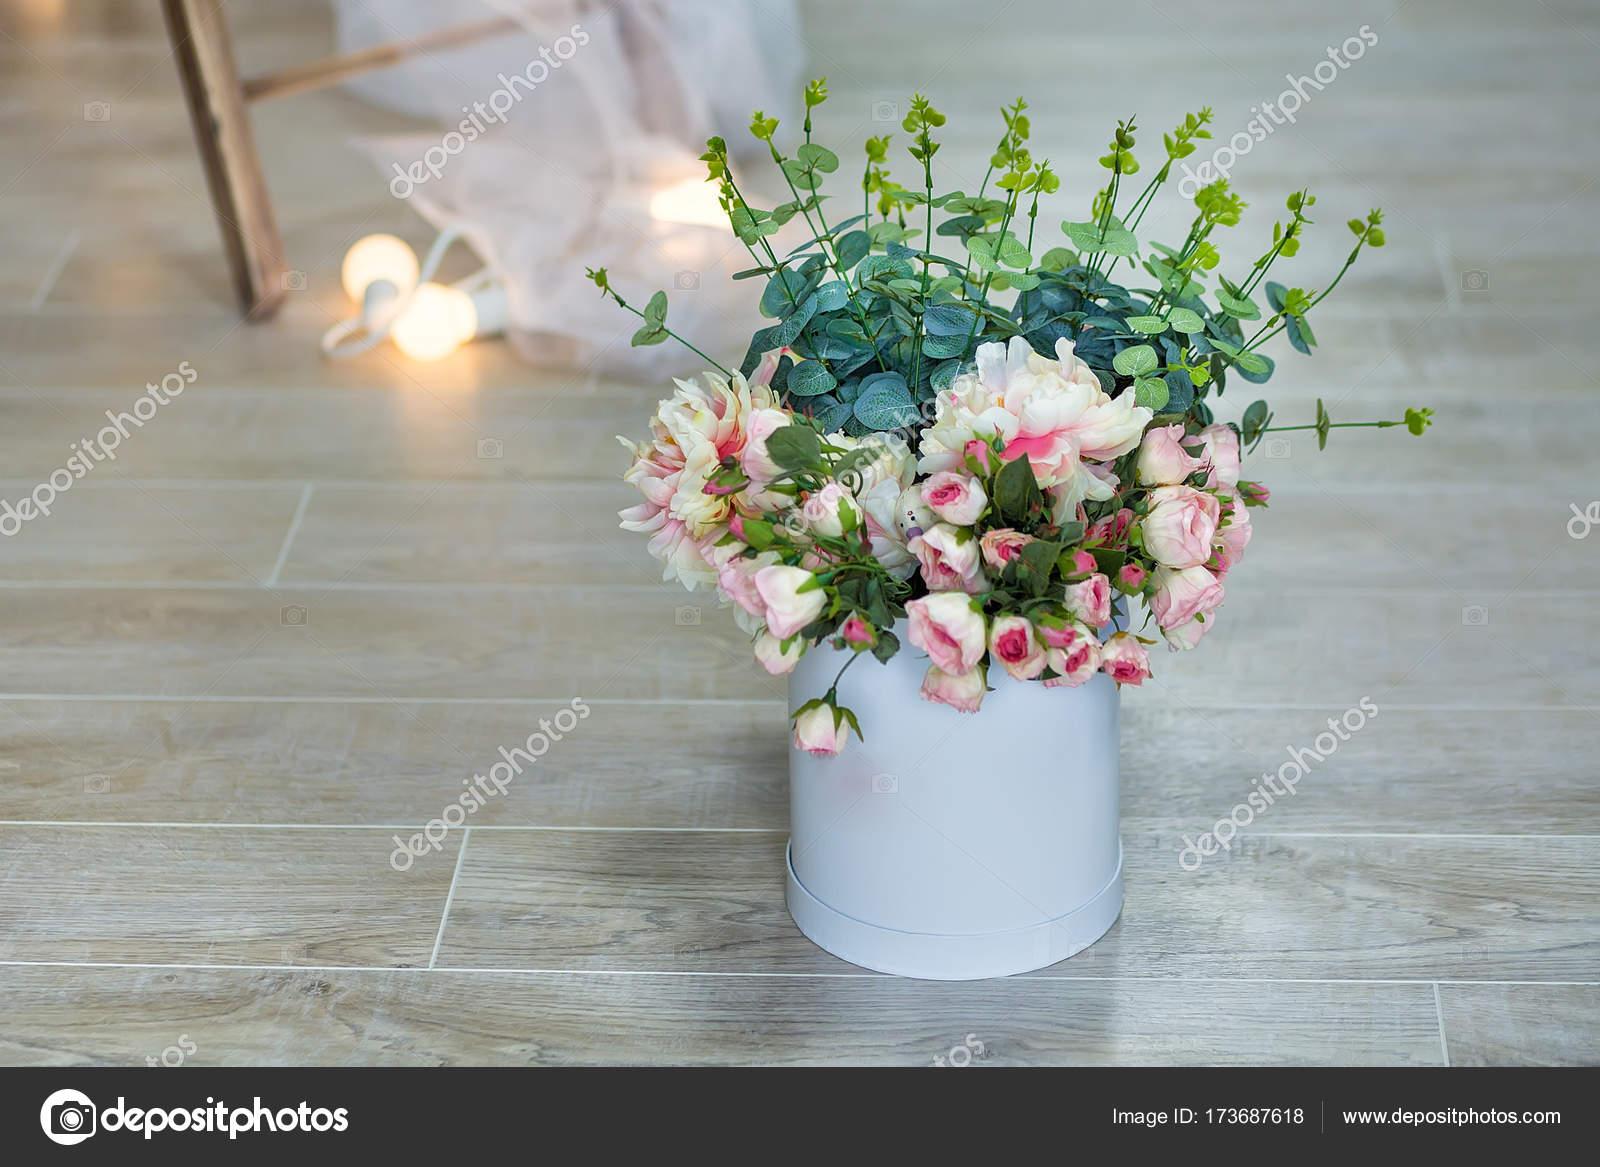 Bouquet of white jasmine flowers in a vase romantic floral still bouquet of white jasmine flowers in a vase romantic floral still life with white jasmine flowers and petals mock orange jasmine philadephus flowers izmirmasajfo